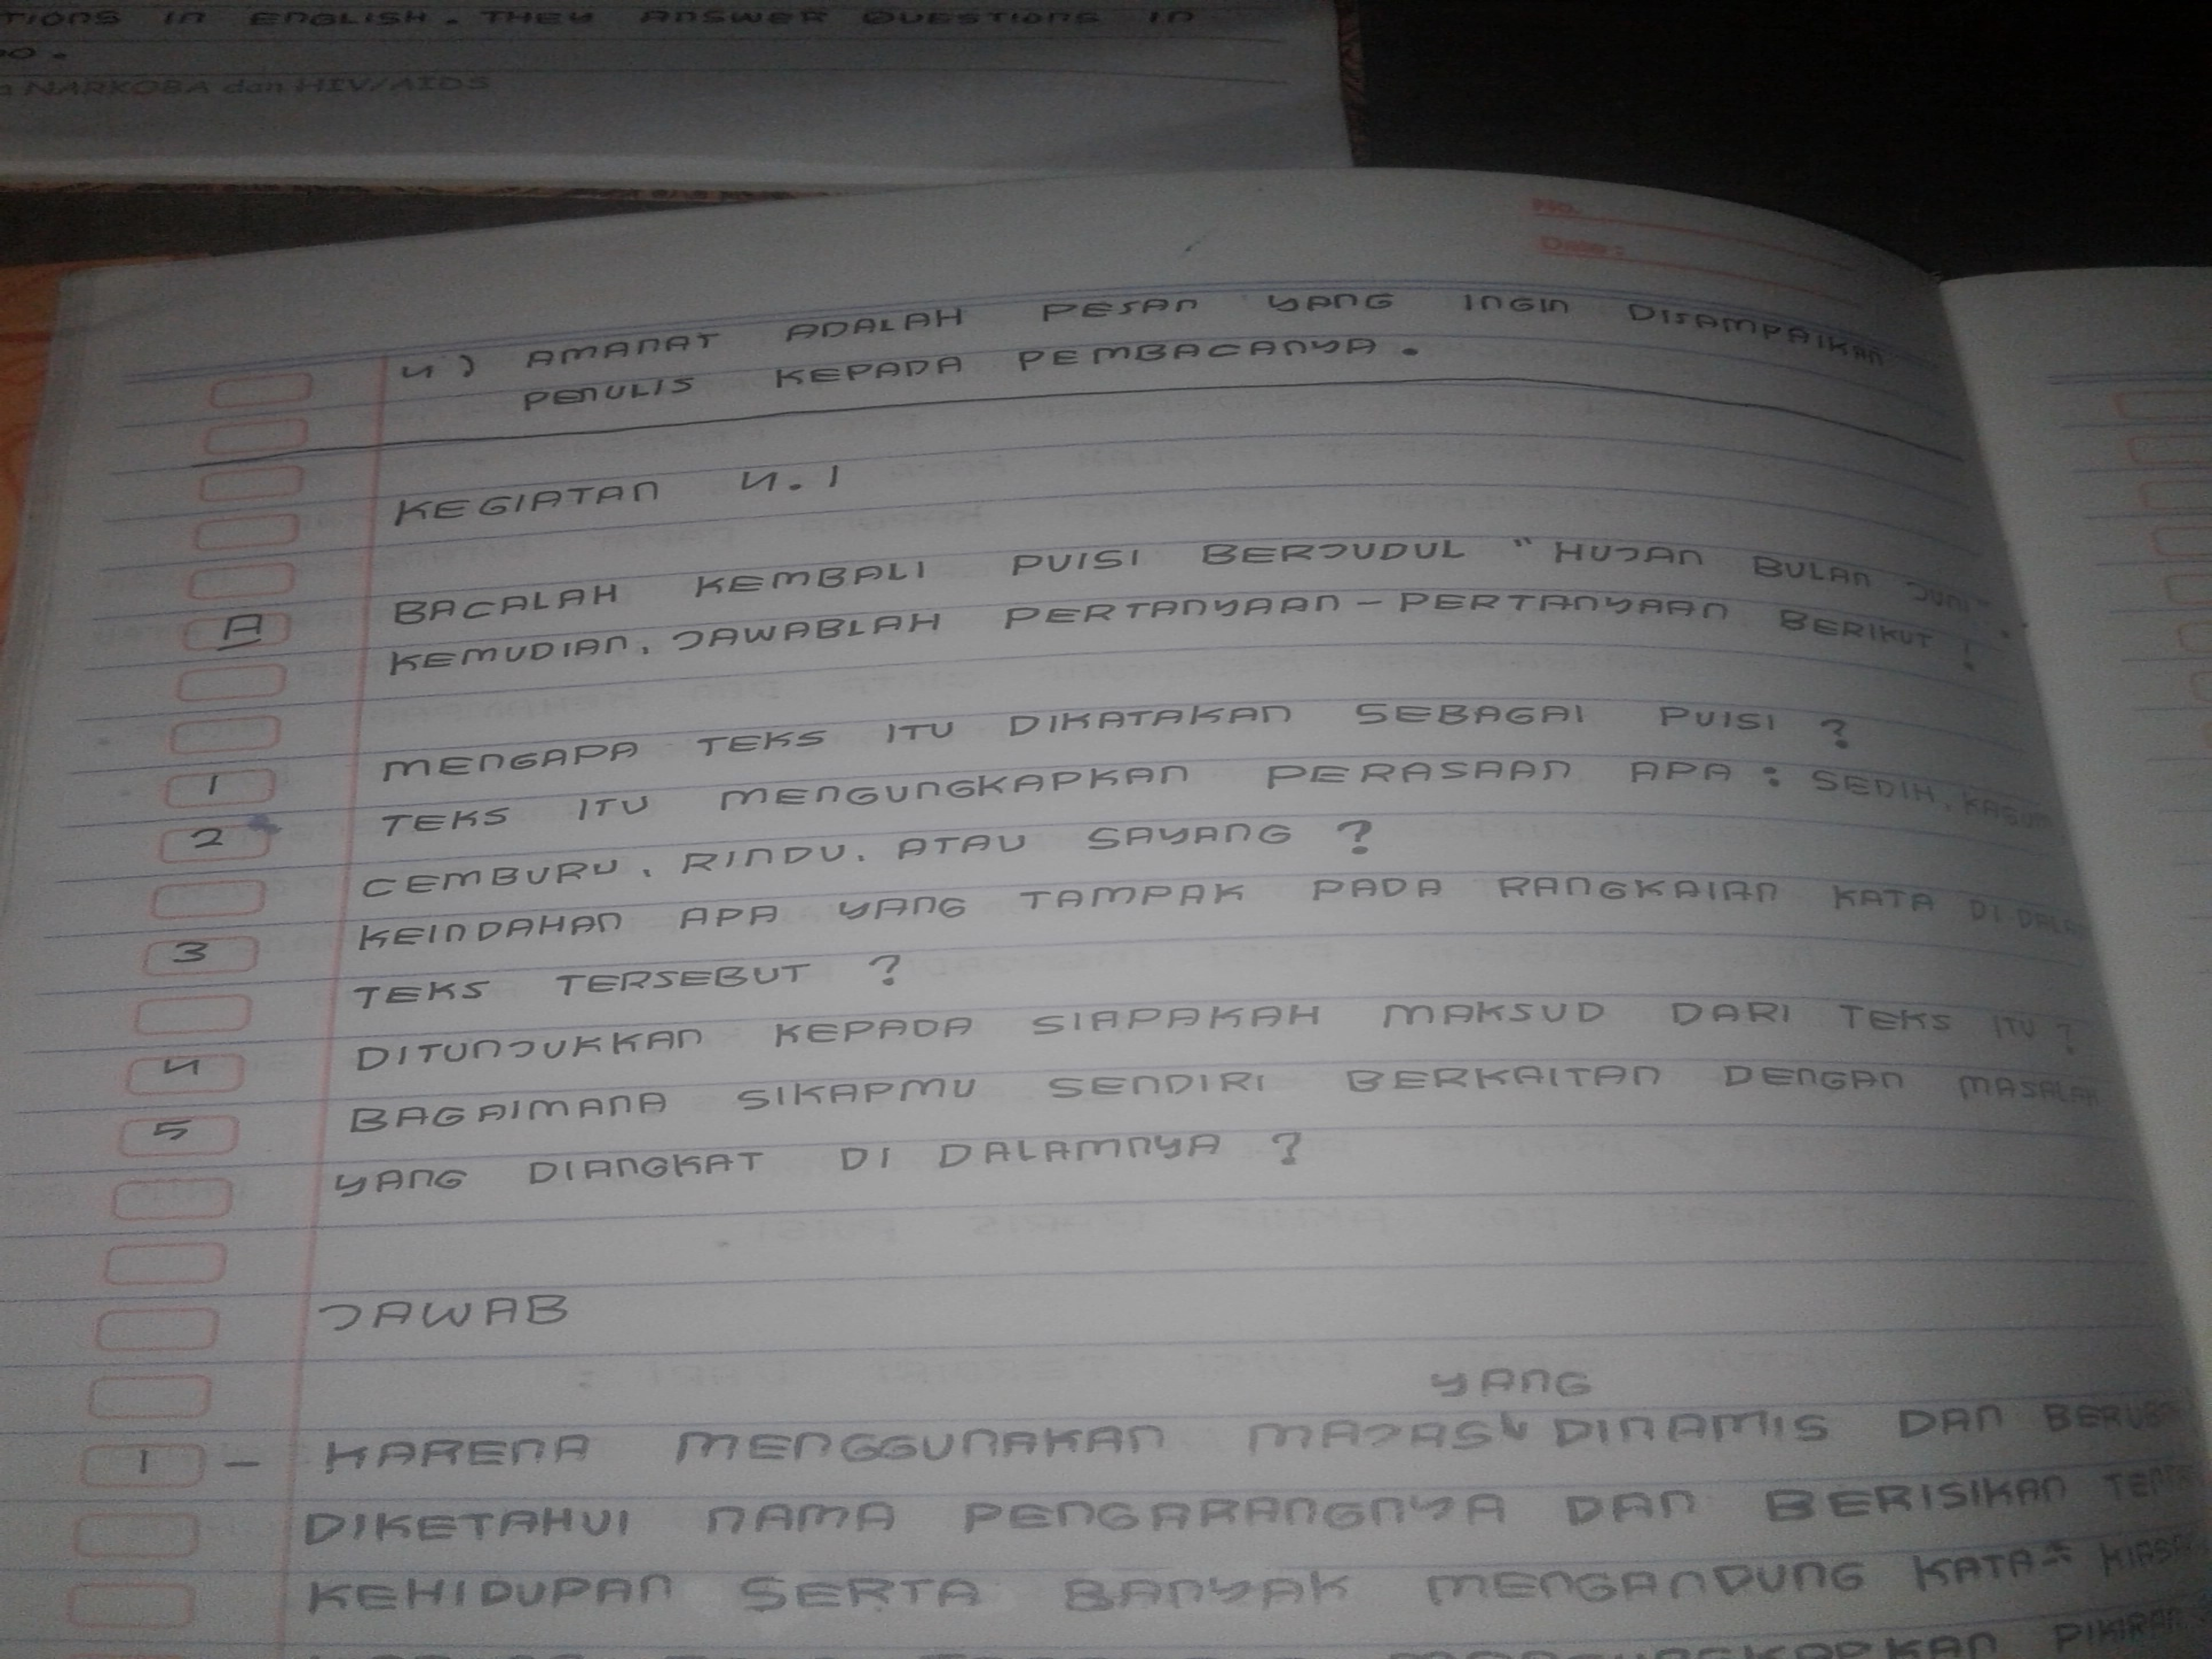 Mohon Jawaban Buku Bahasa Indonesia Kelas 8